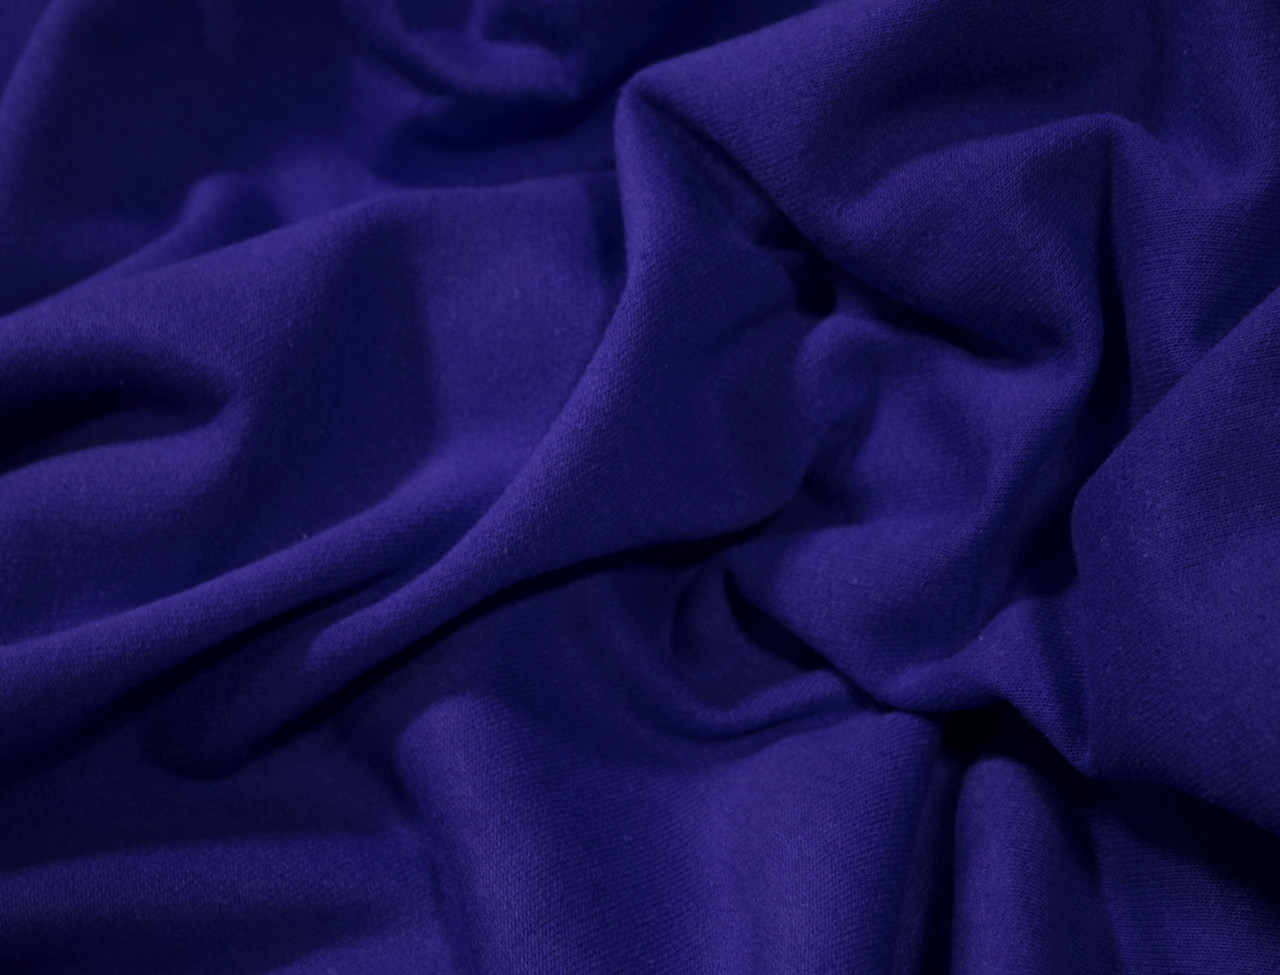 Футер двунитка с начесом синий электрик (220см, Турция)